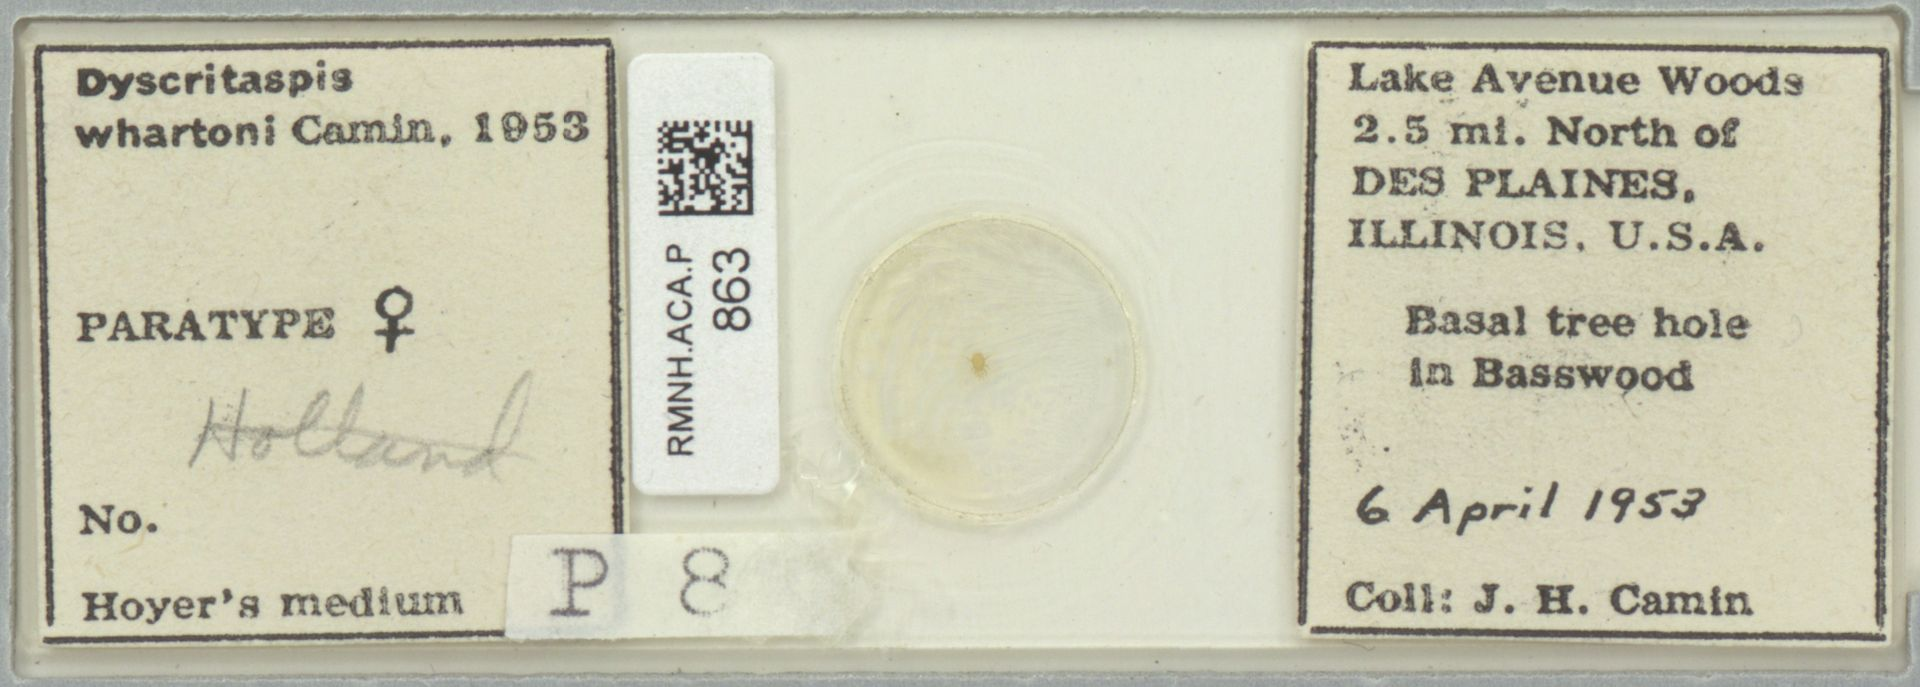 RMNH.ACA.P.863   Dyscritaspis whartoni Camin, 1953